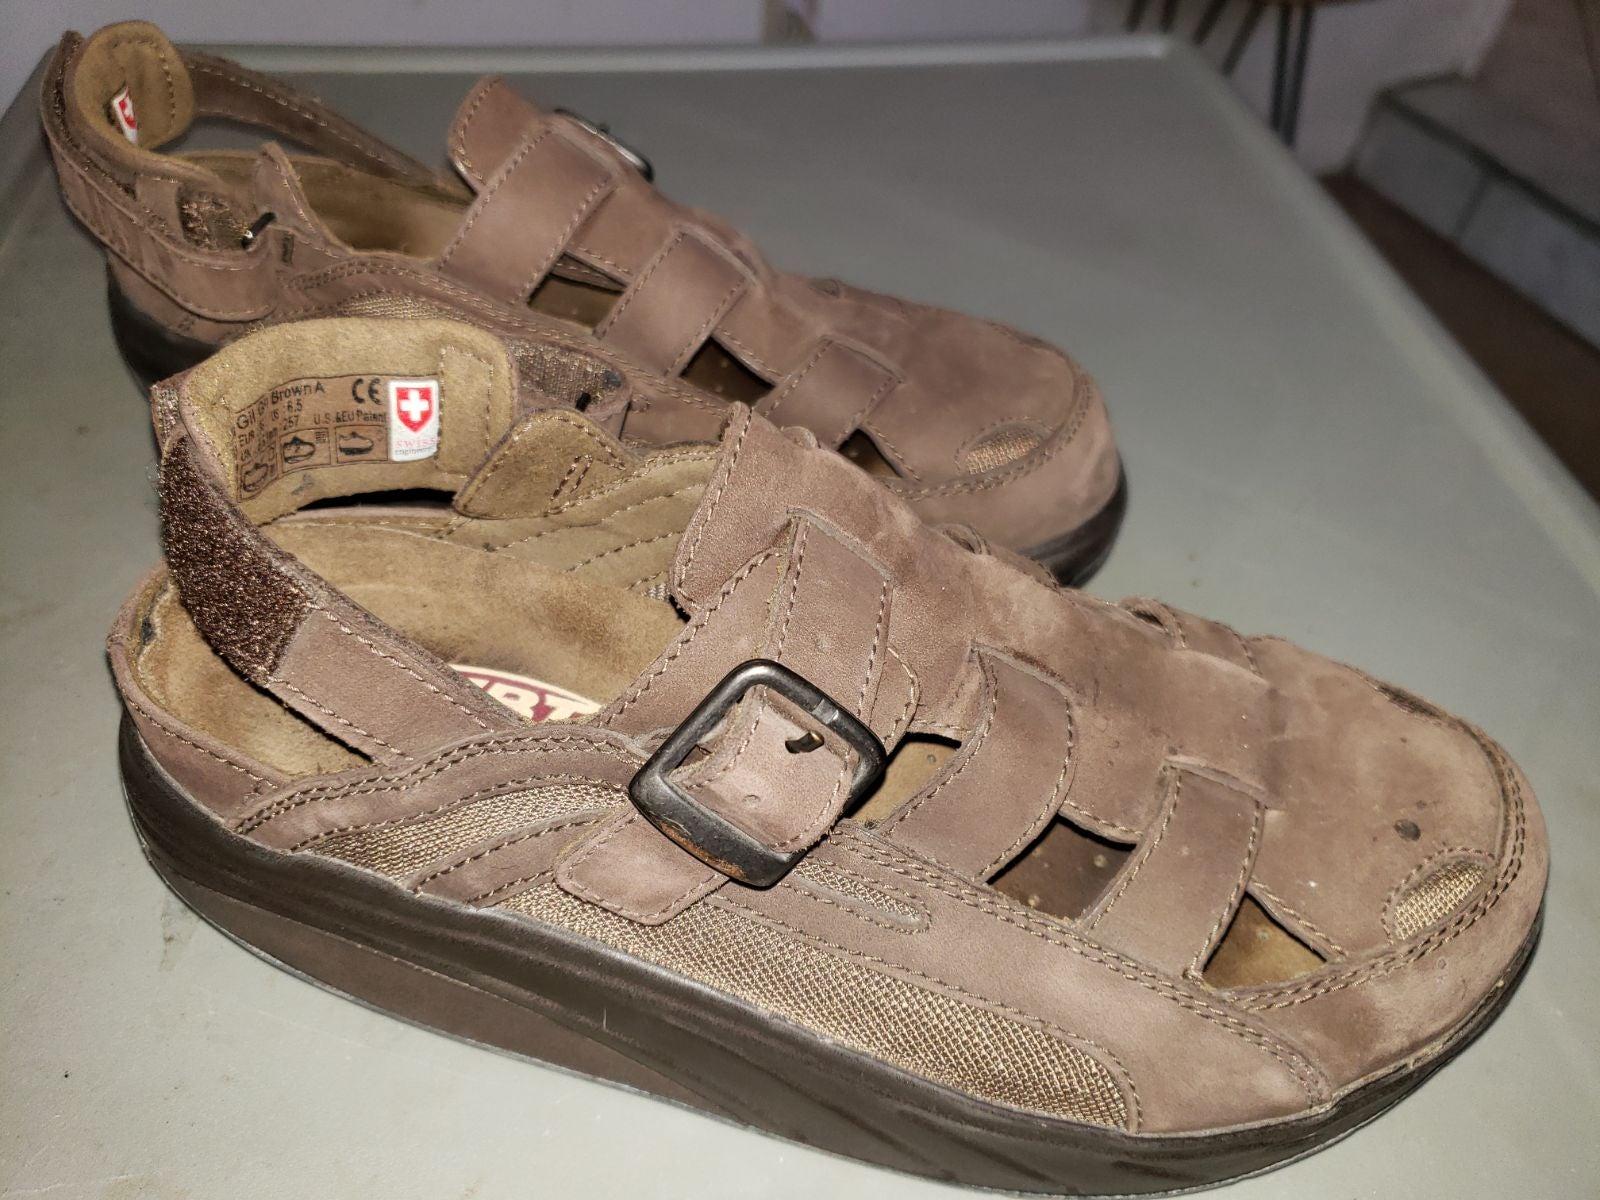 MBT Swiss Engineered Closed-Toe Sandals